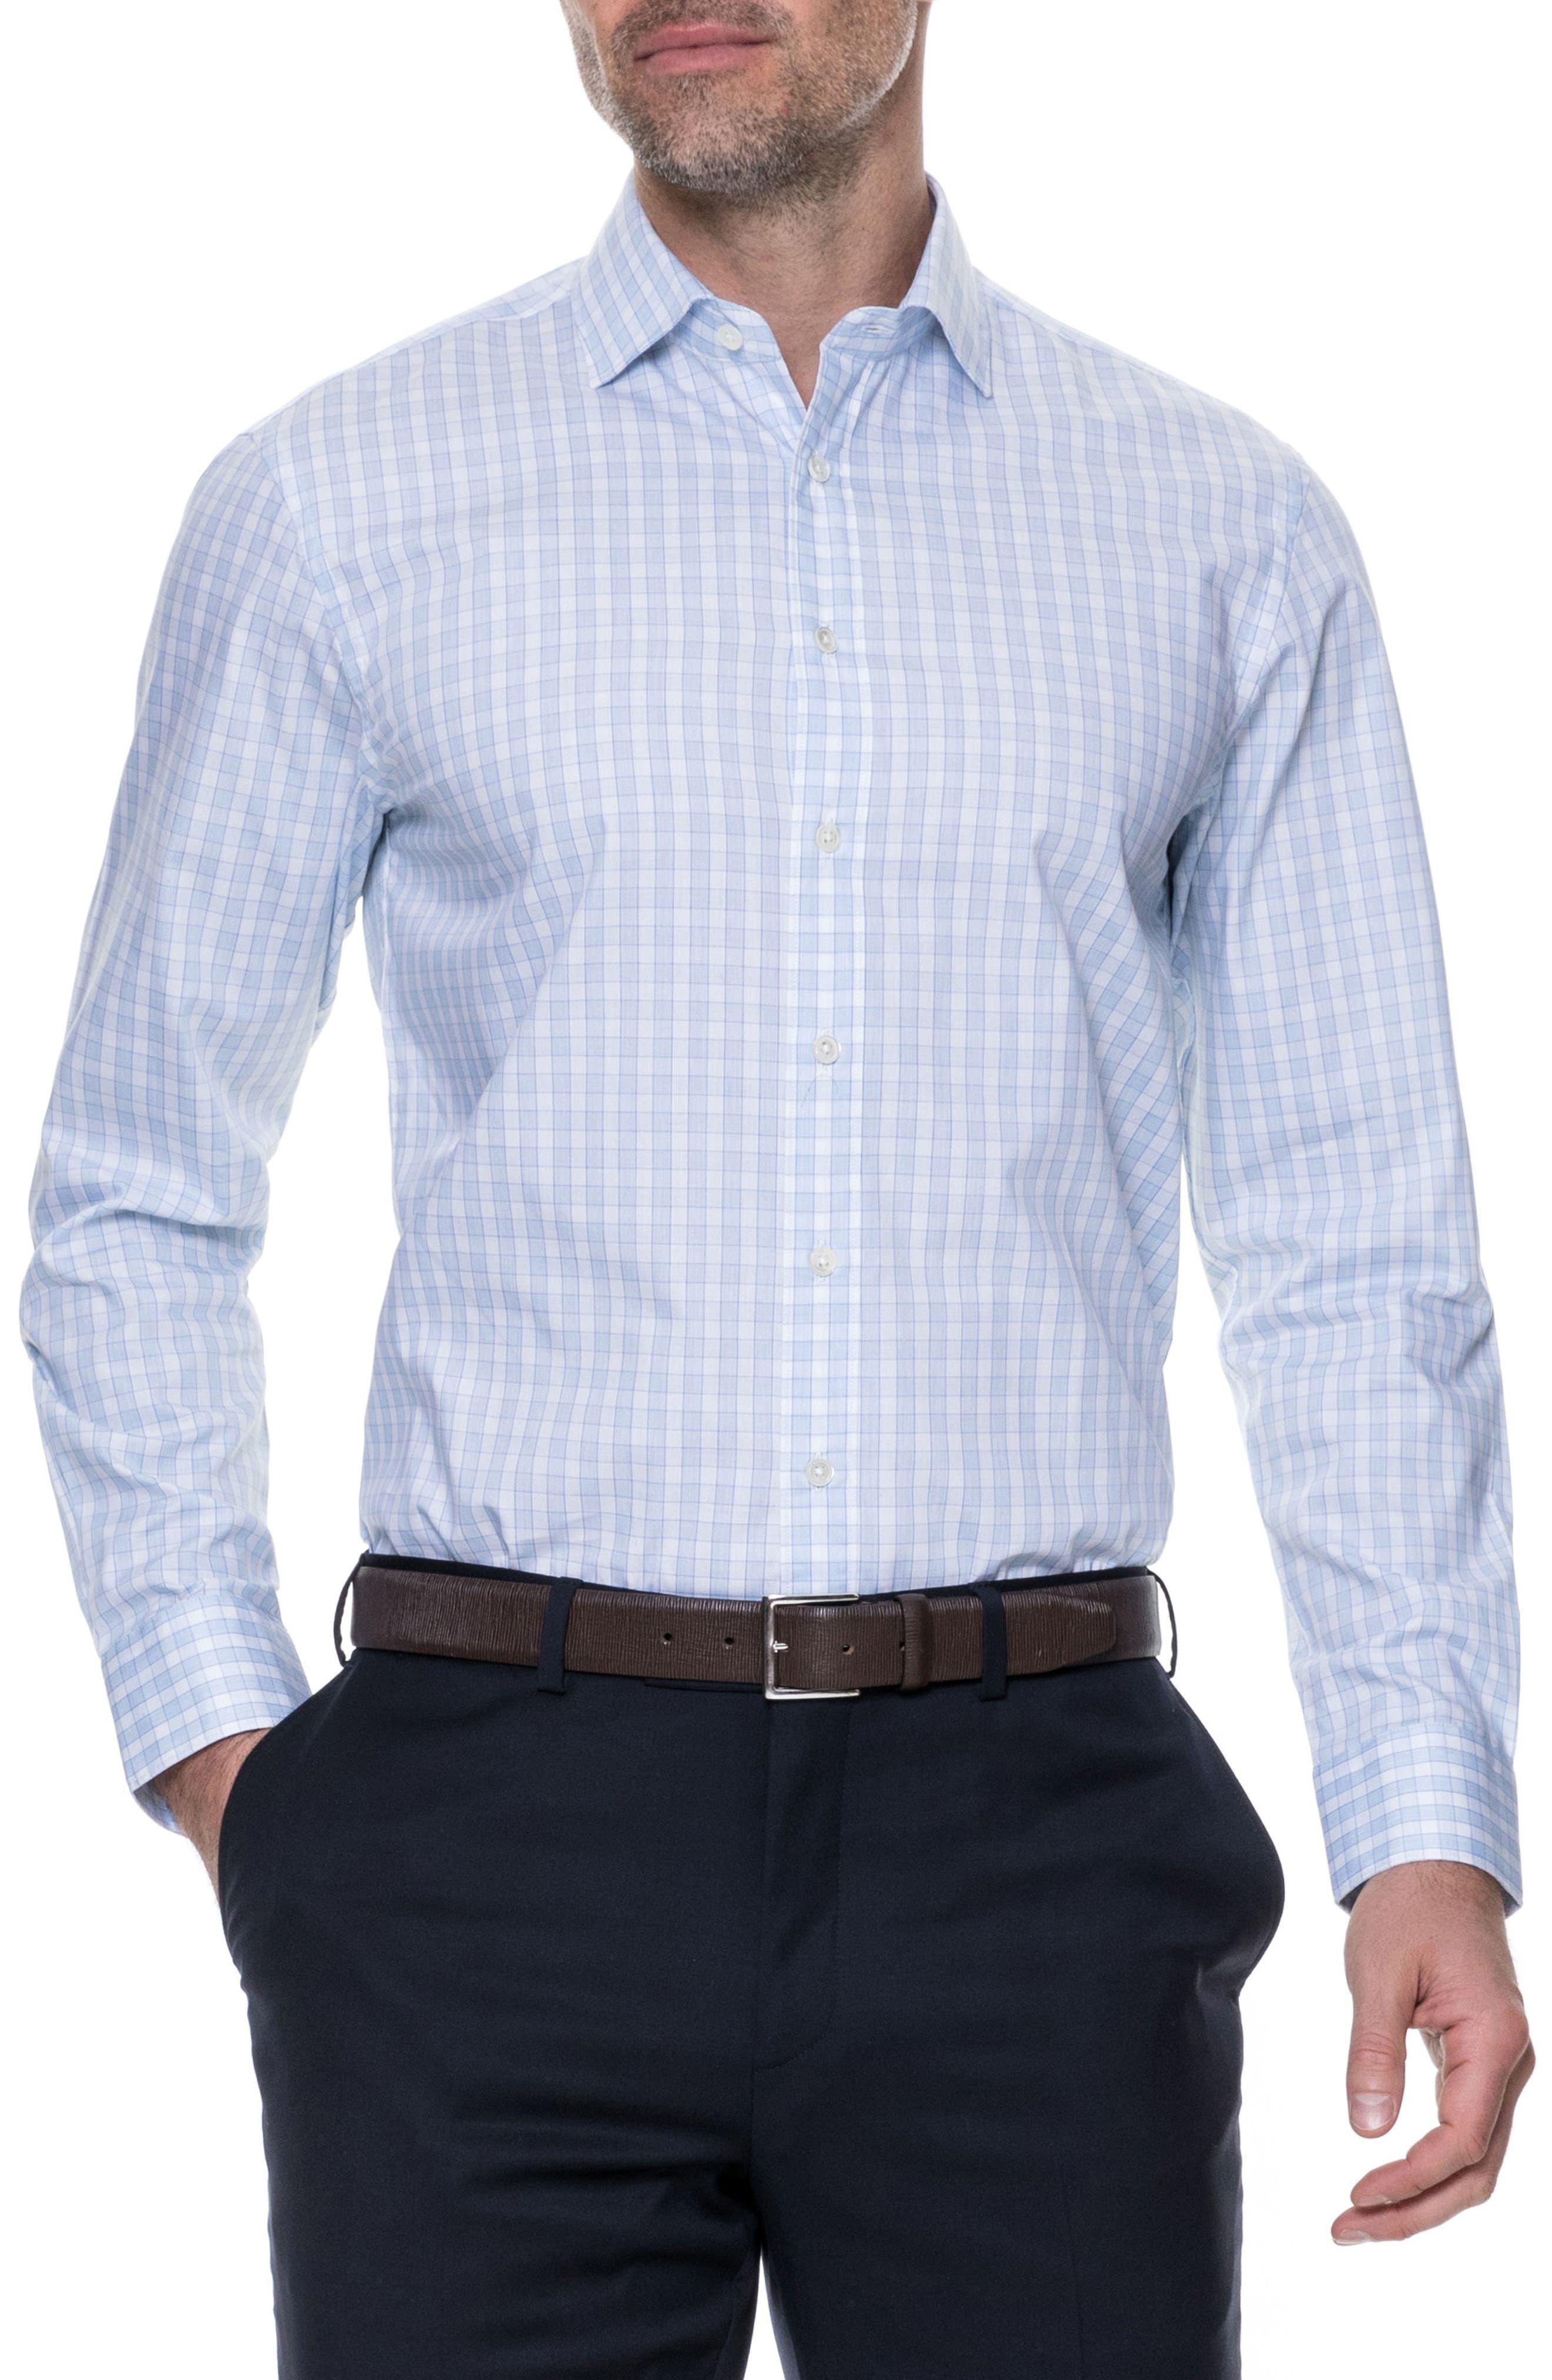 Brackley Slim Fit Sport Shirt,                             Main thumbnail 1, color,                             Sky